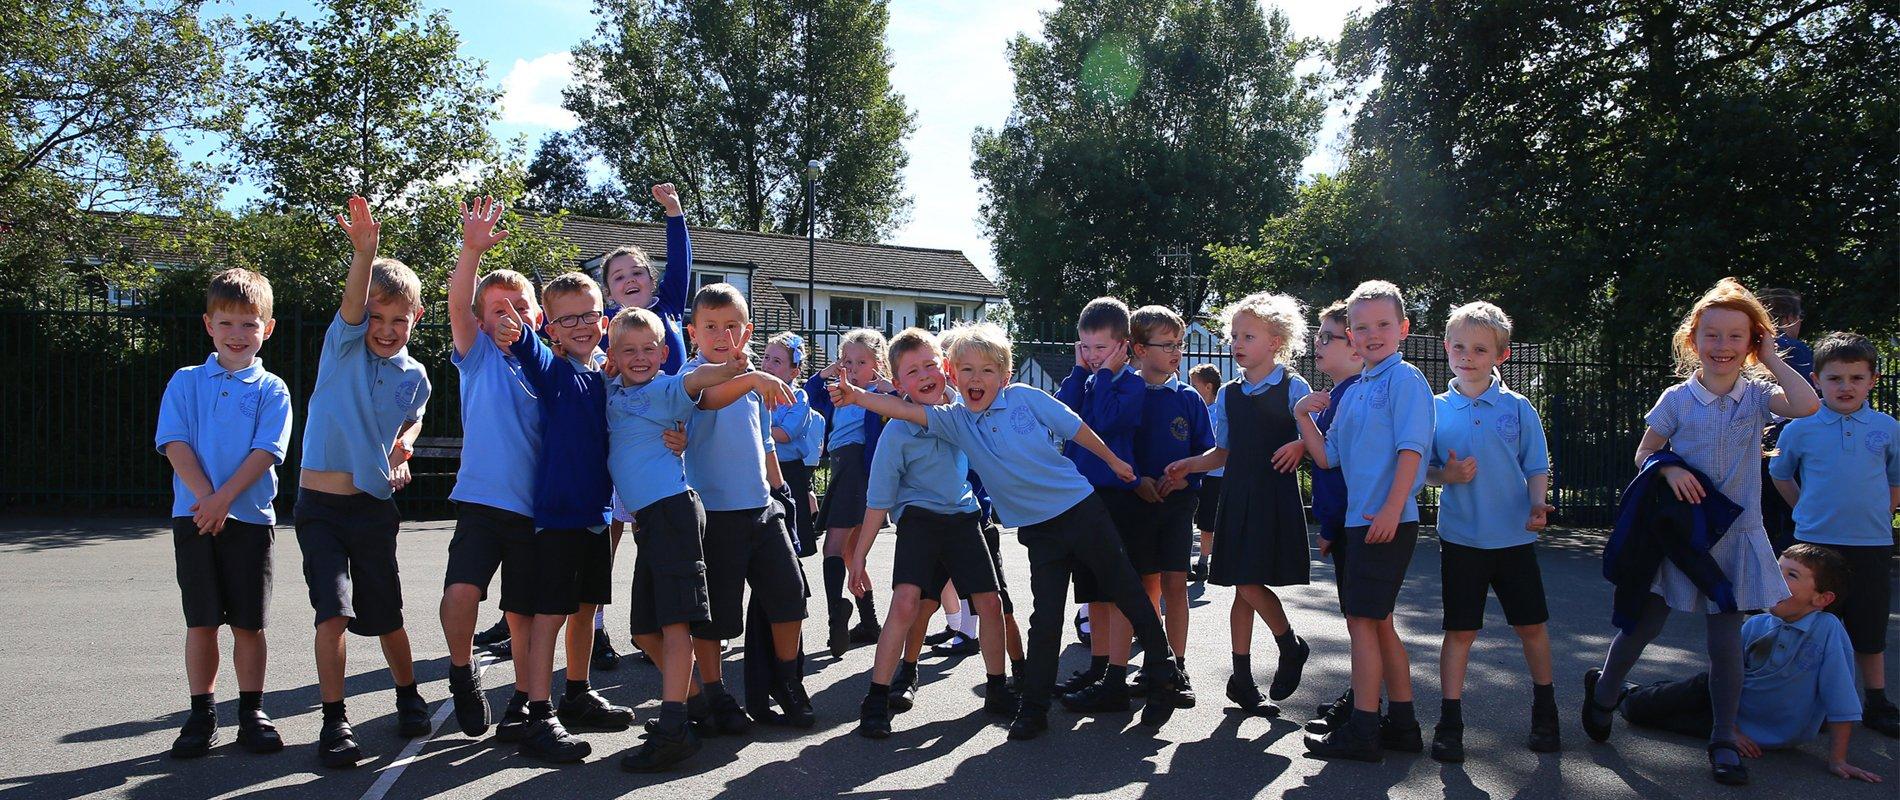 Welcome to Euxton CE Primary School.